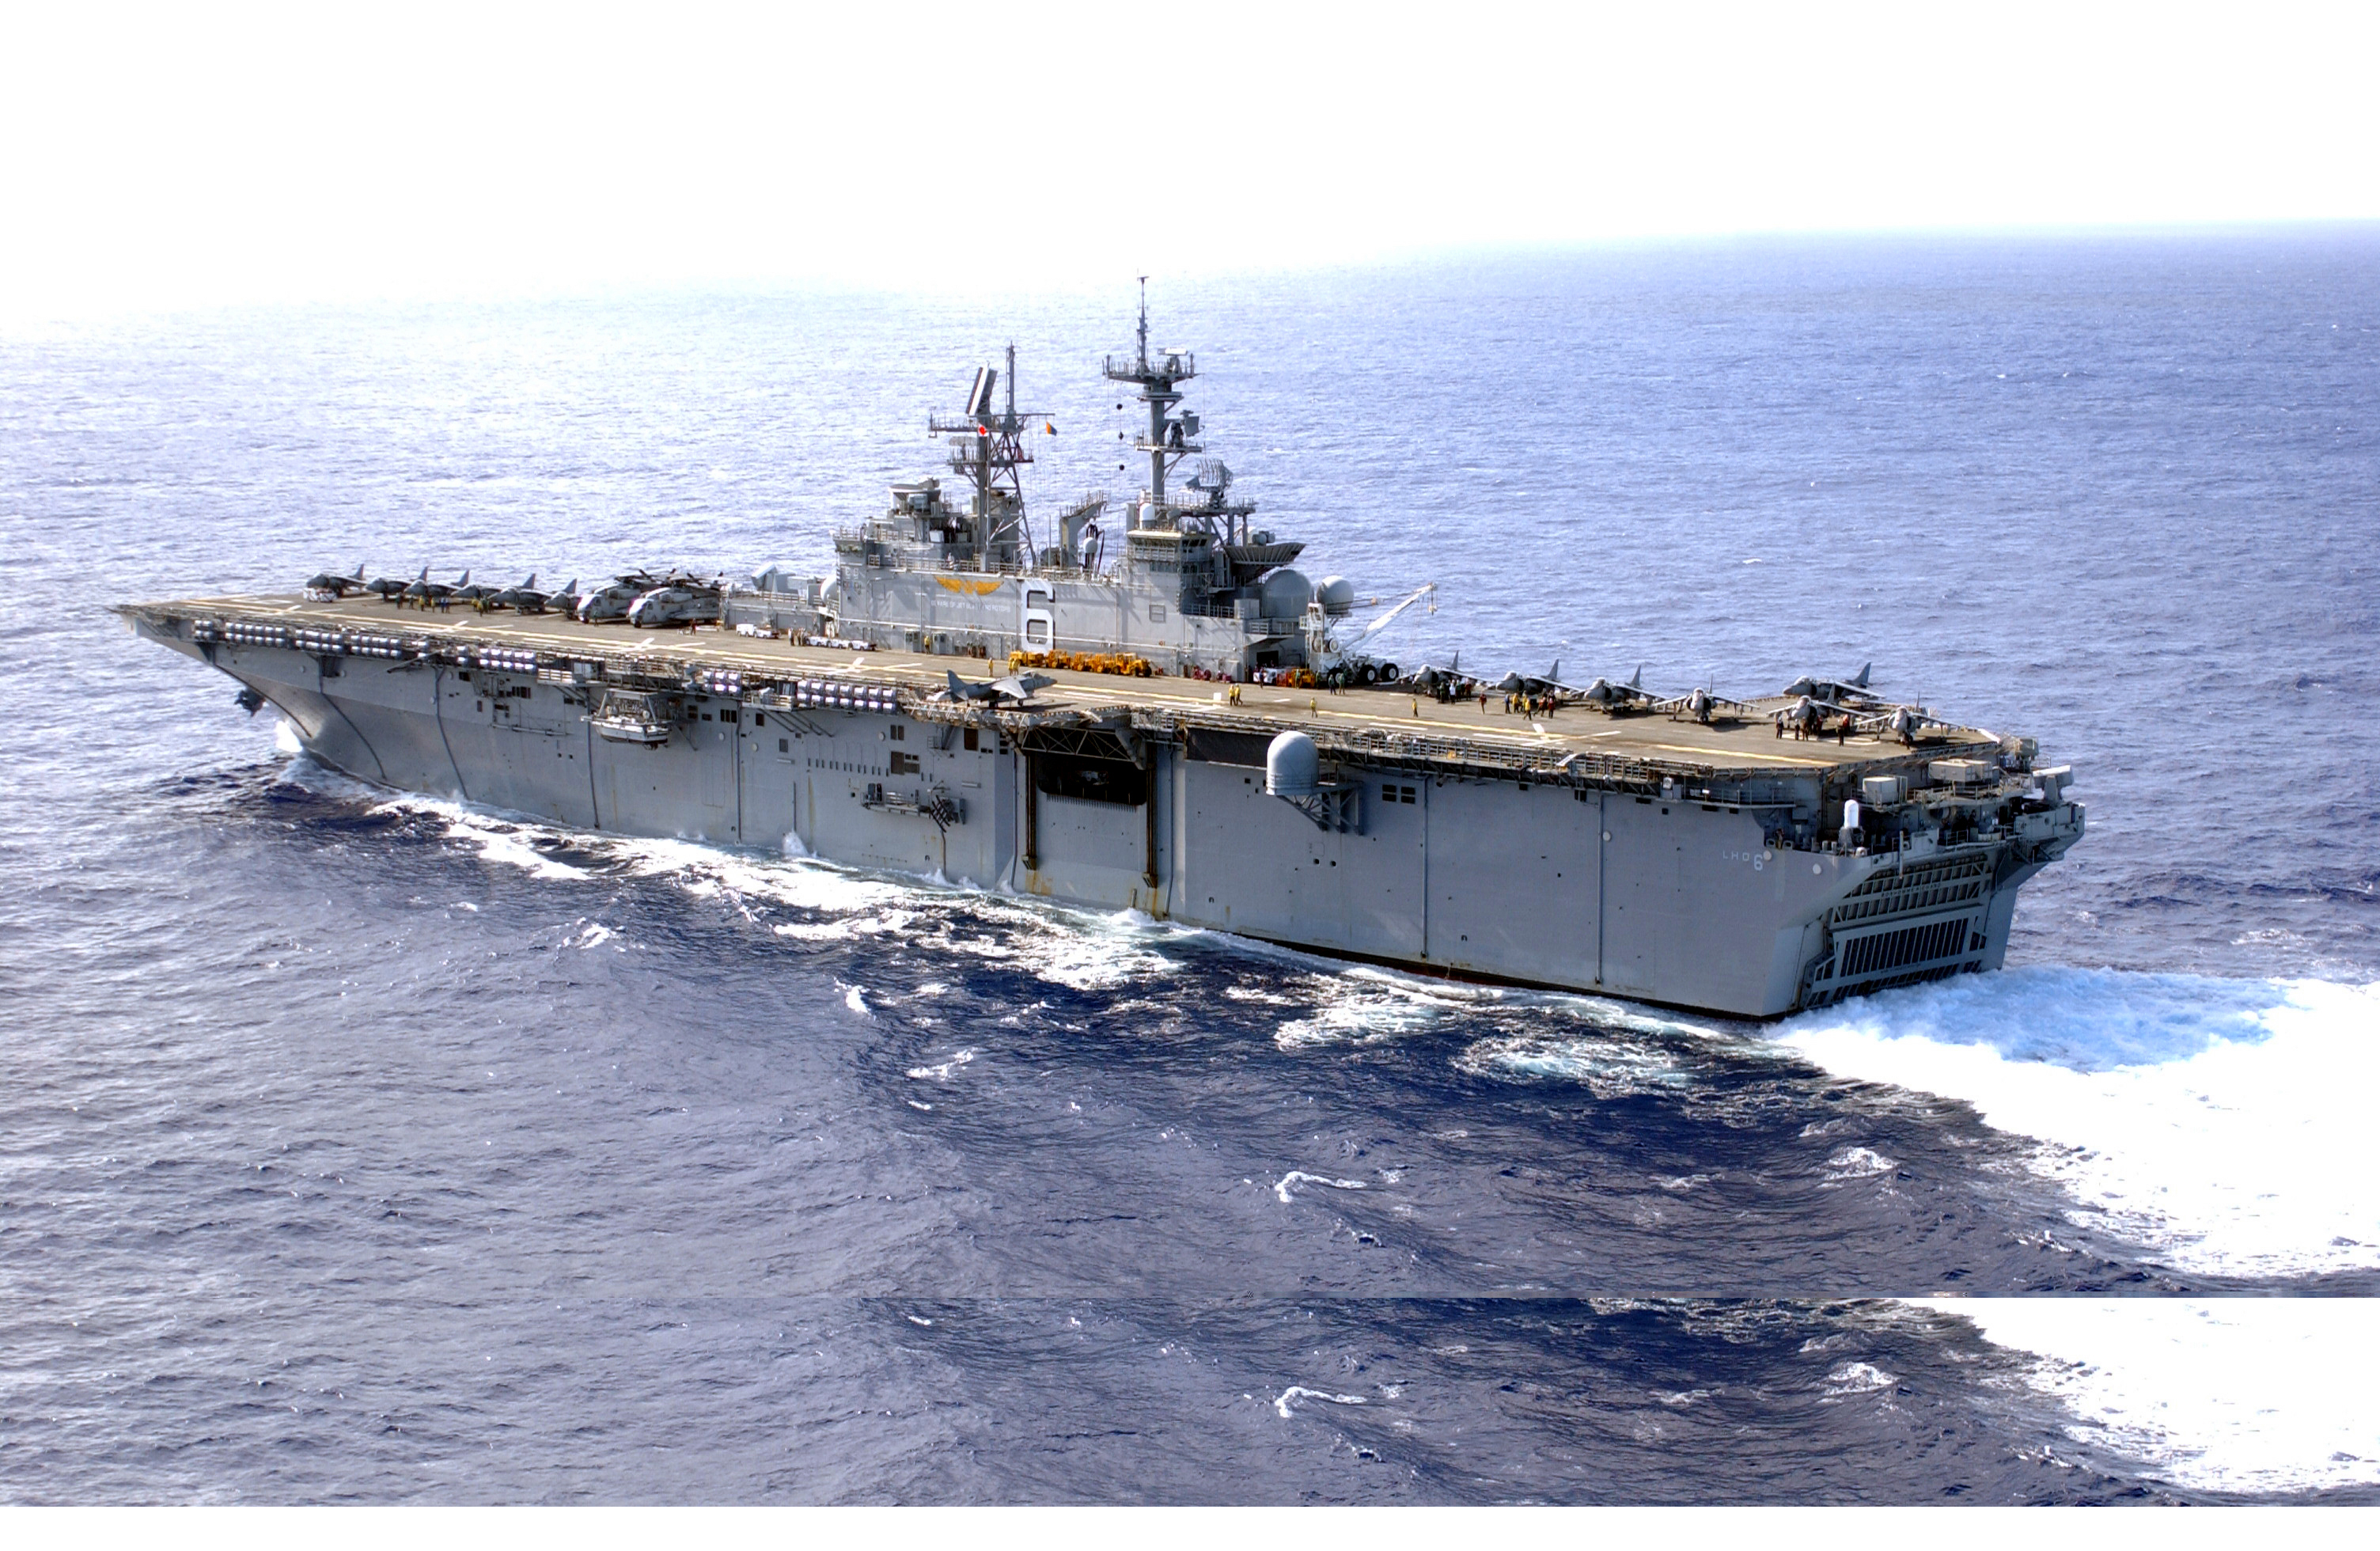 USS Bonhomme Richard (LHD-6) - Wikipedia